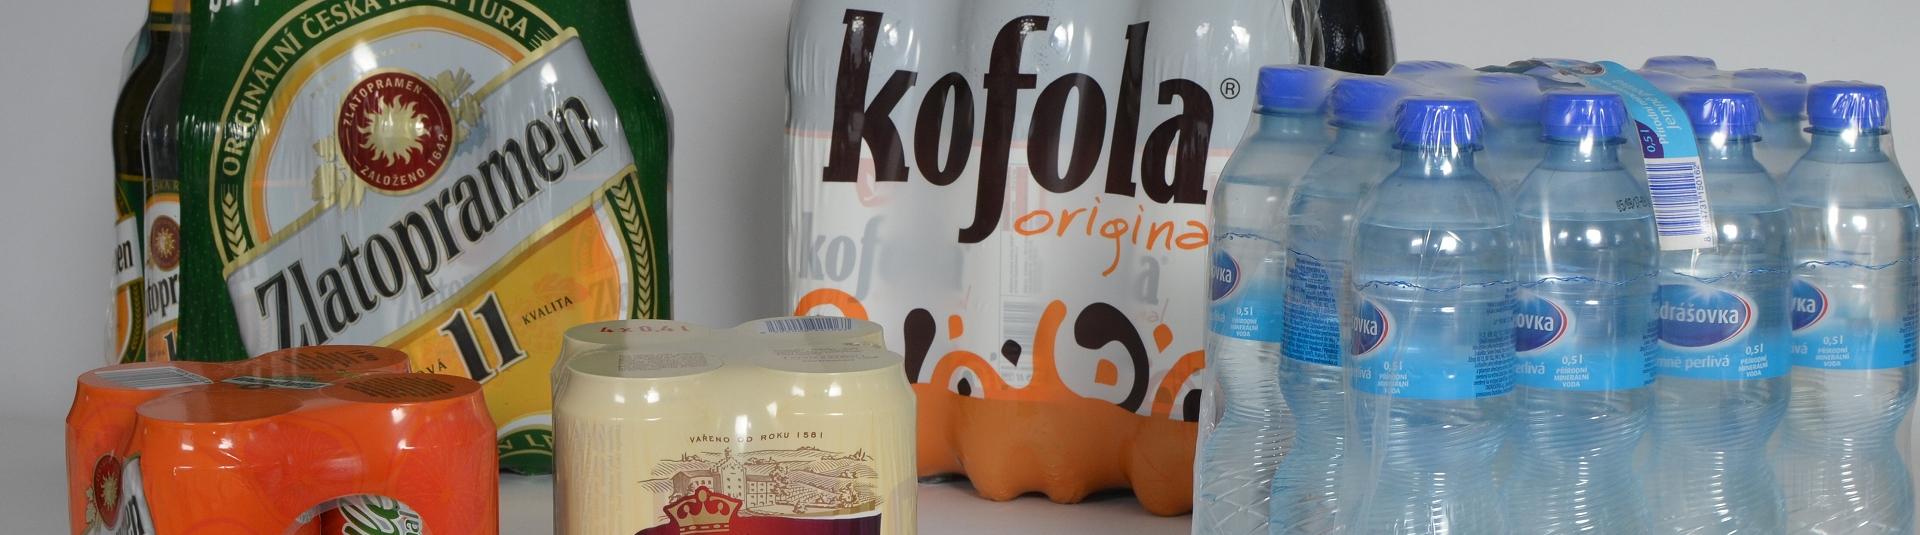 303e13807dd Group Packaging Films    Kofola